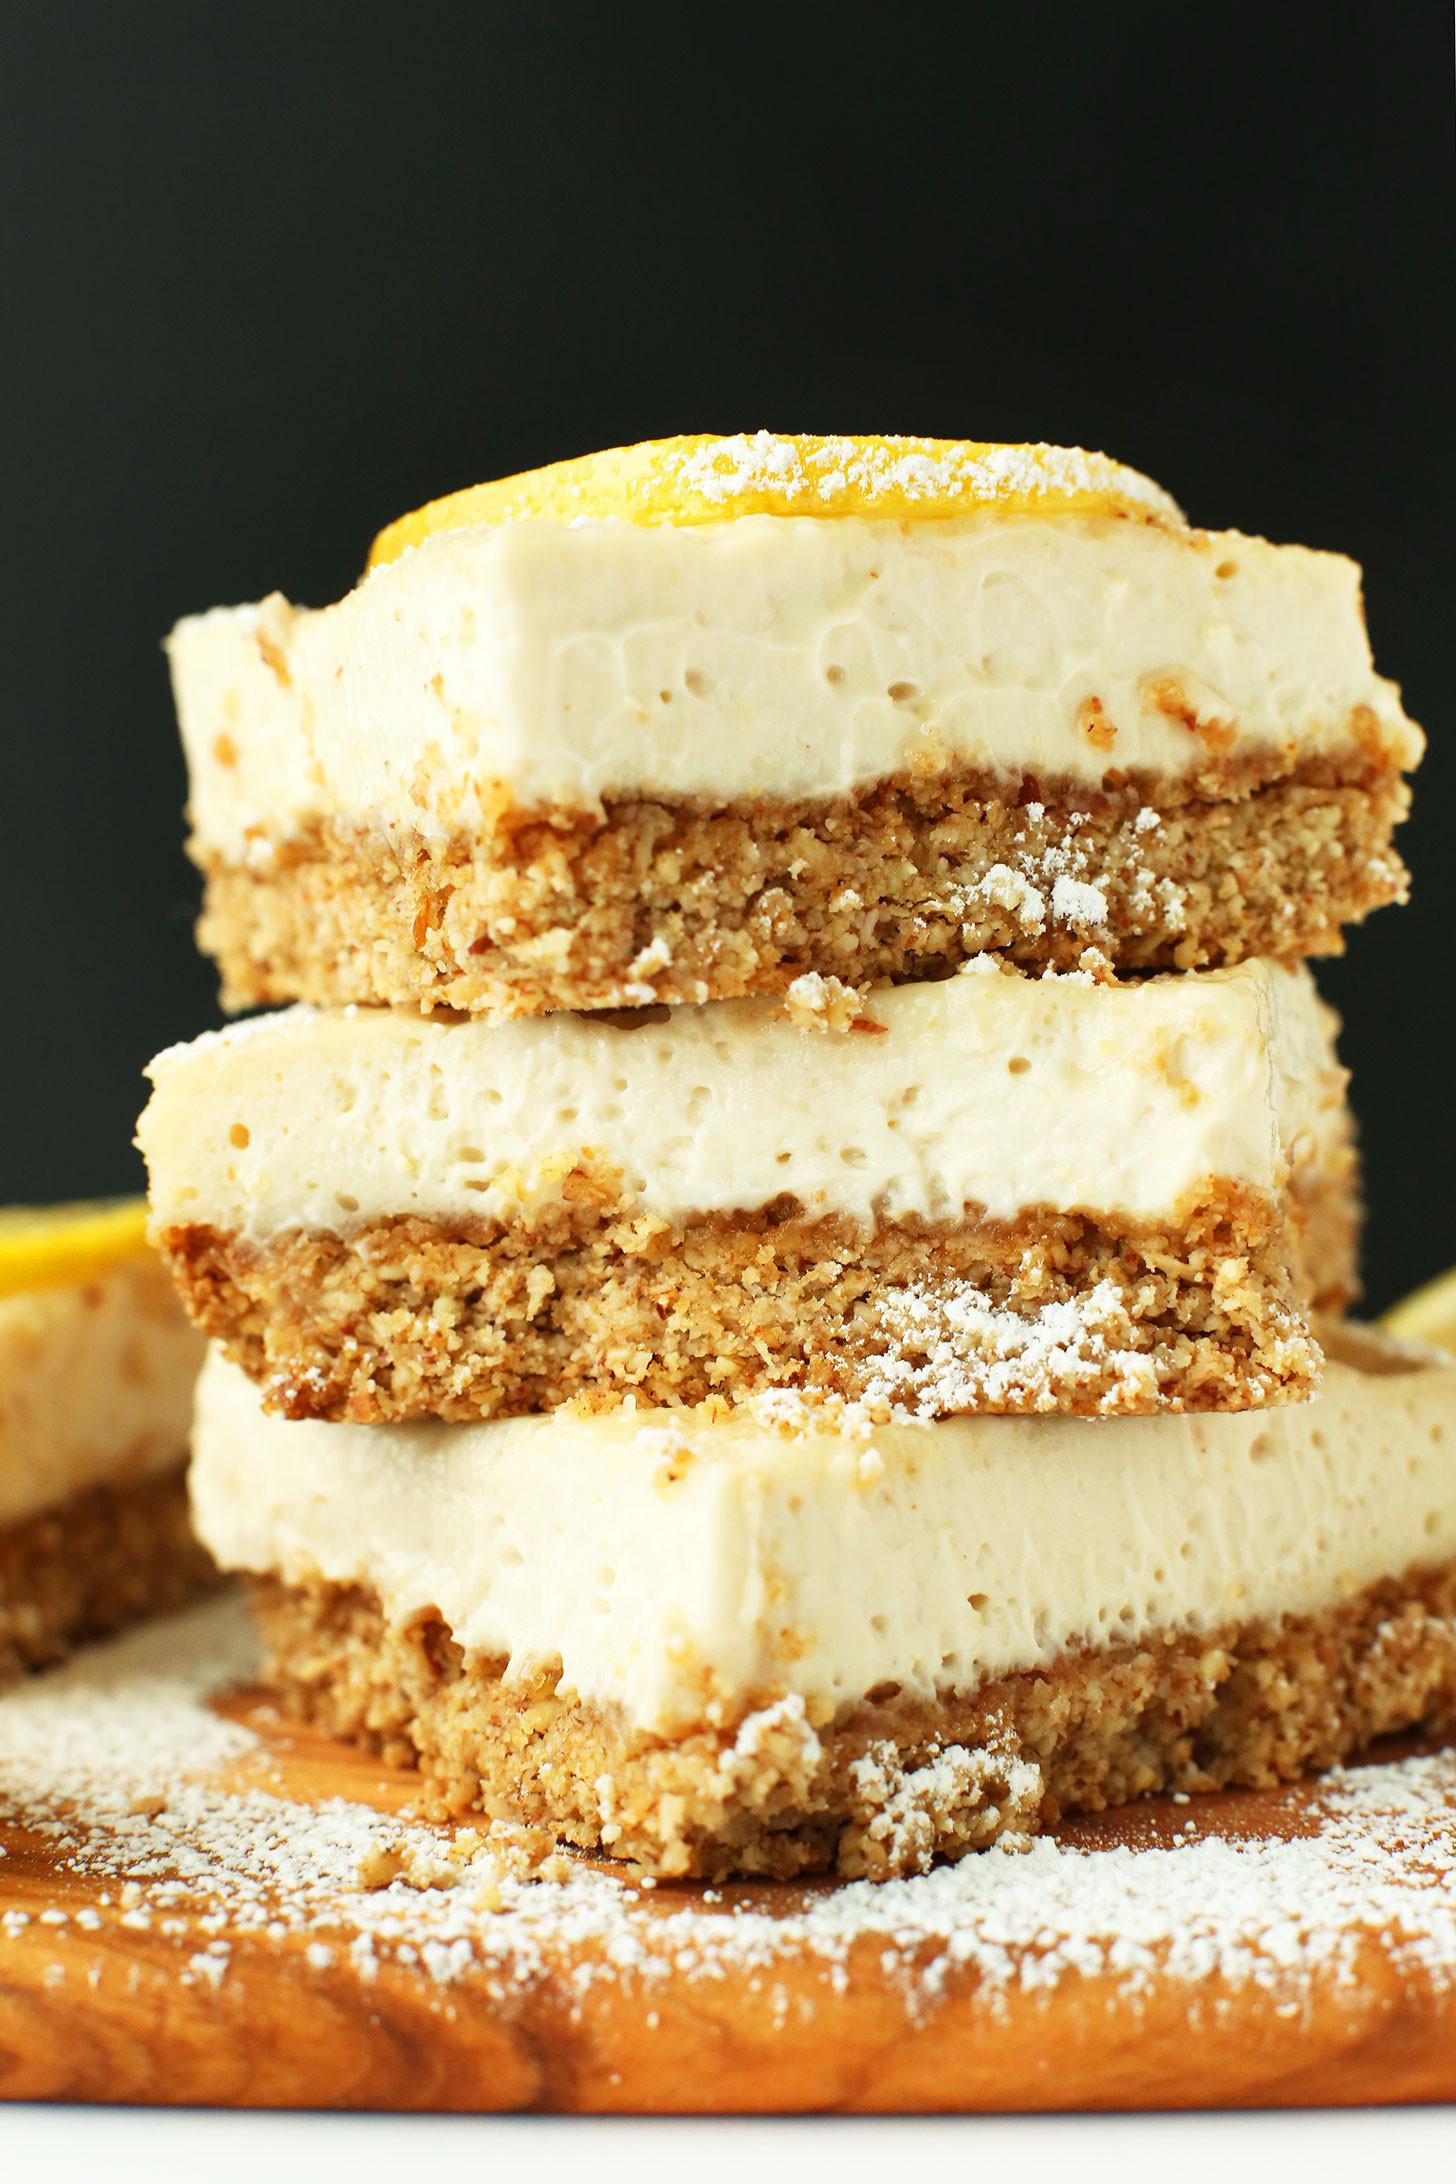 Vegan Dairy Free Desserts  Creamy Vegan Lemon Bars GF